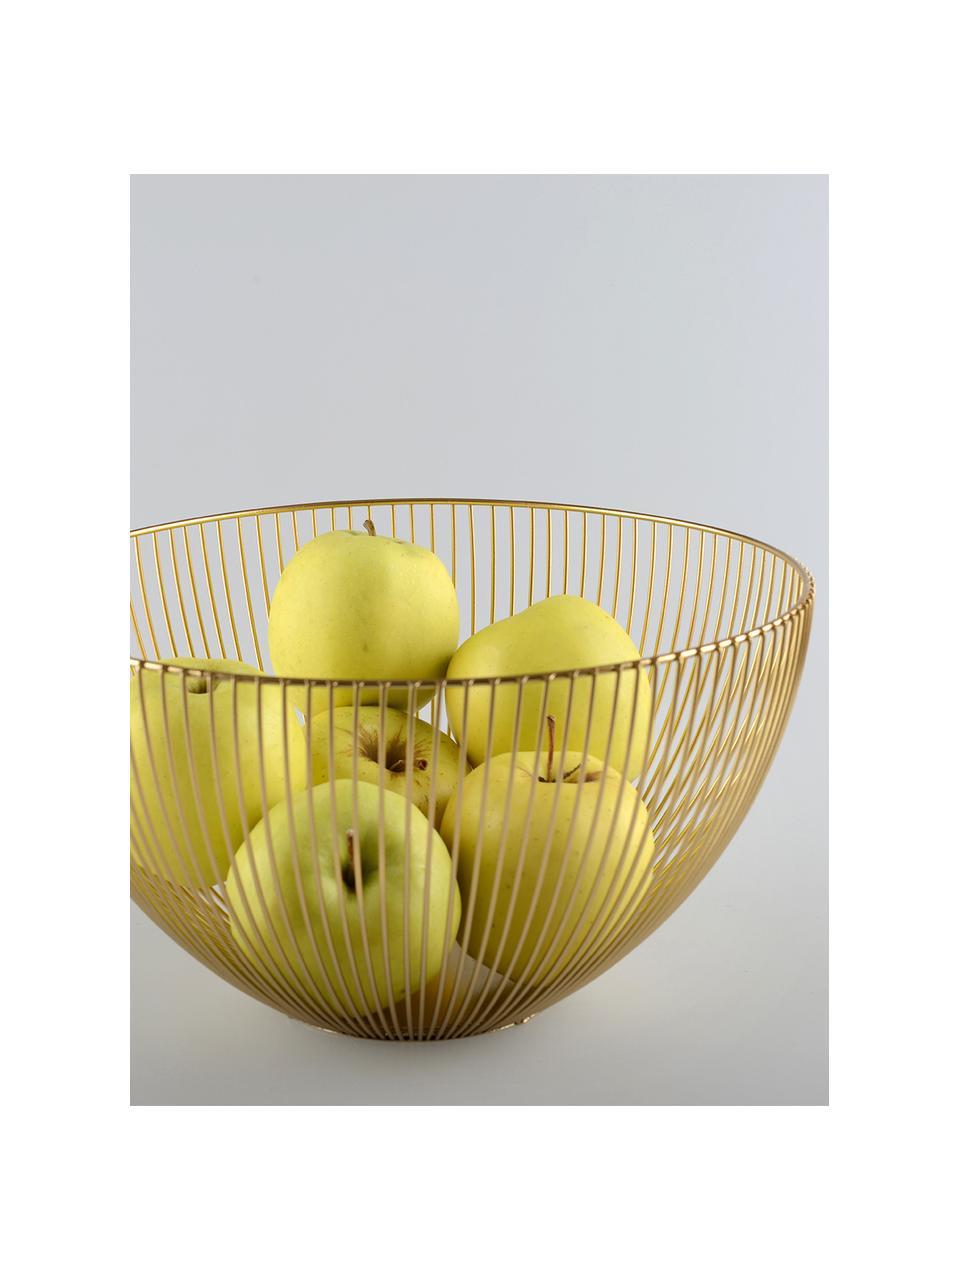 Goldfarbener Aufbewahrungskorb Conic, Metall, beschichtet, Messingfarben, Ø 25 x H 14 cm